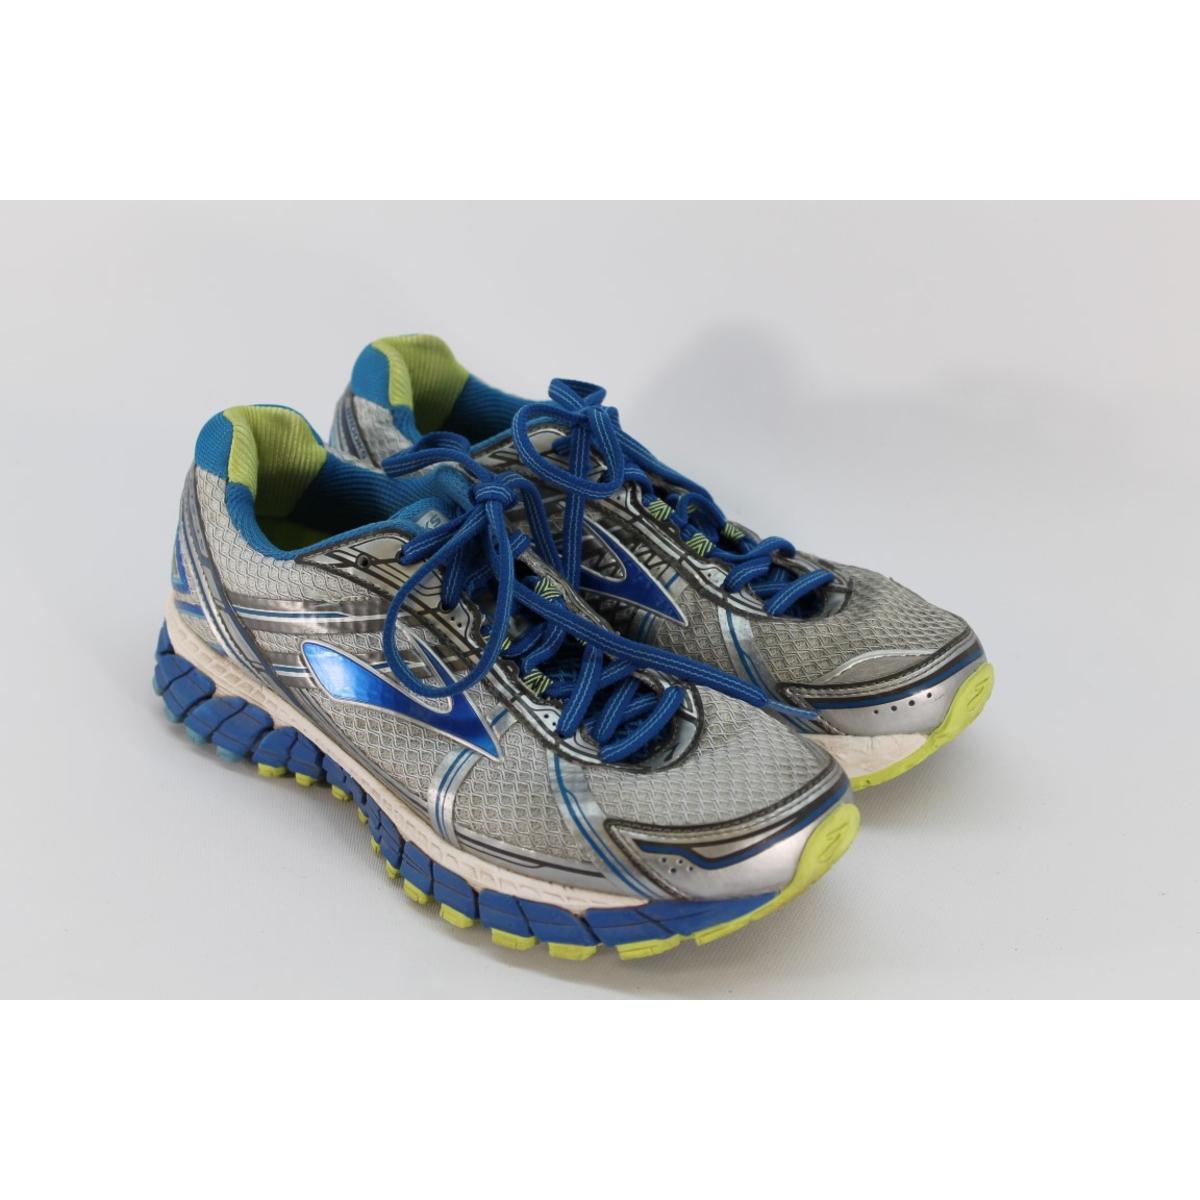 cc84435ce42d2 Details about Brooks Women s Adrenaline GTS 15 White Blue Running Shoe 9M